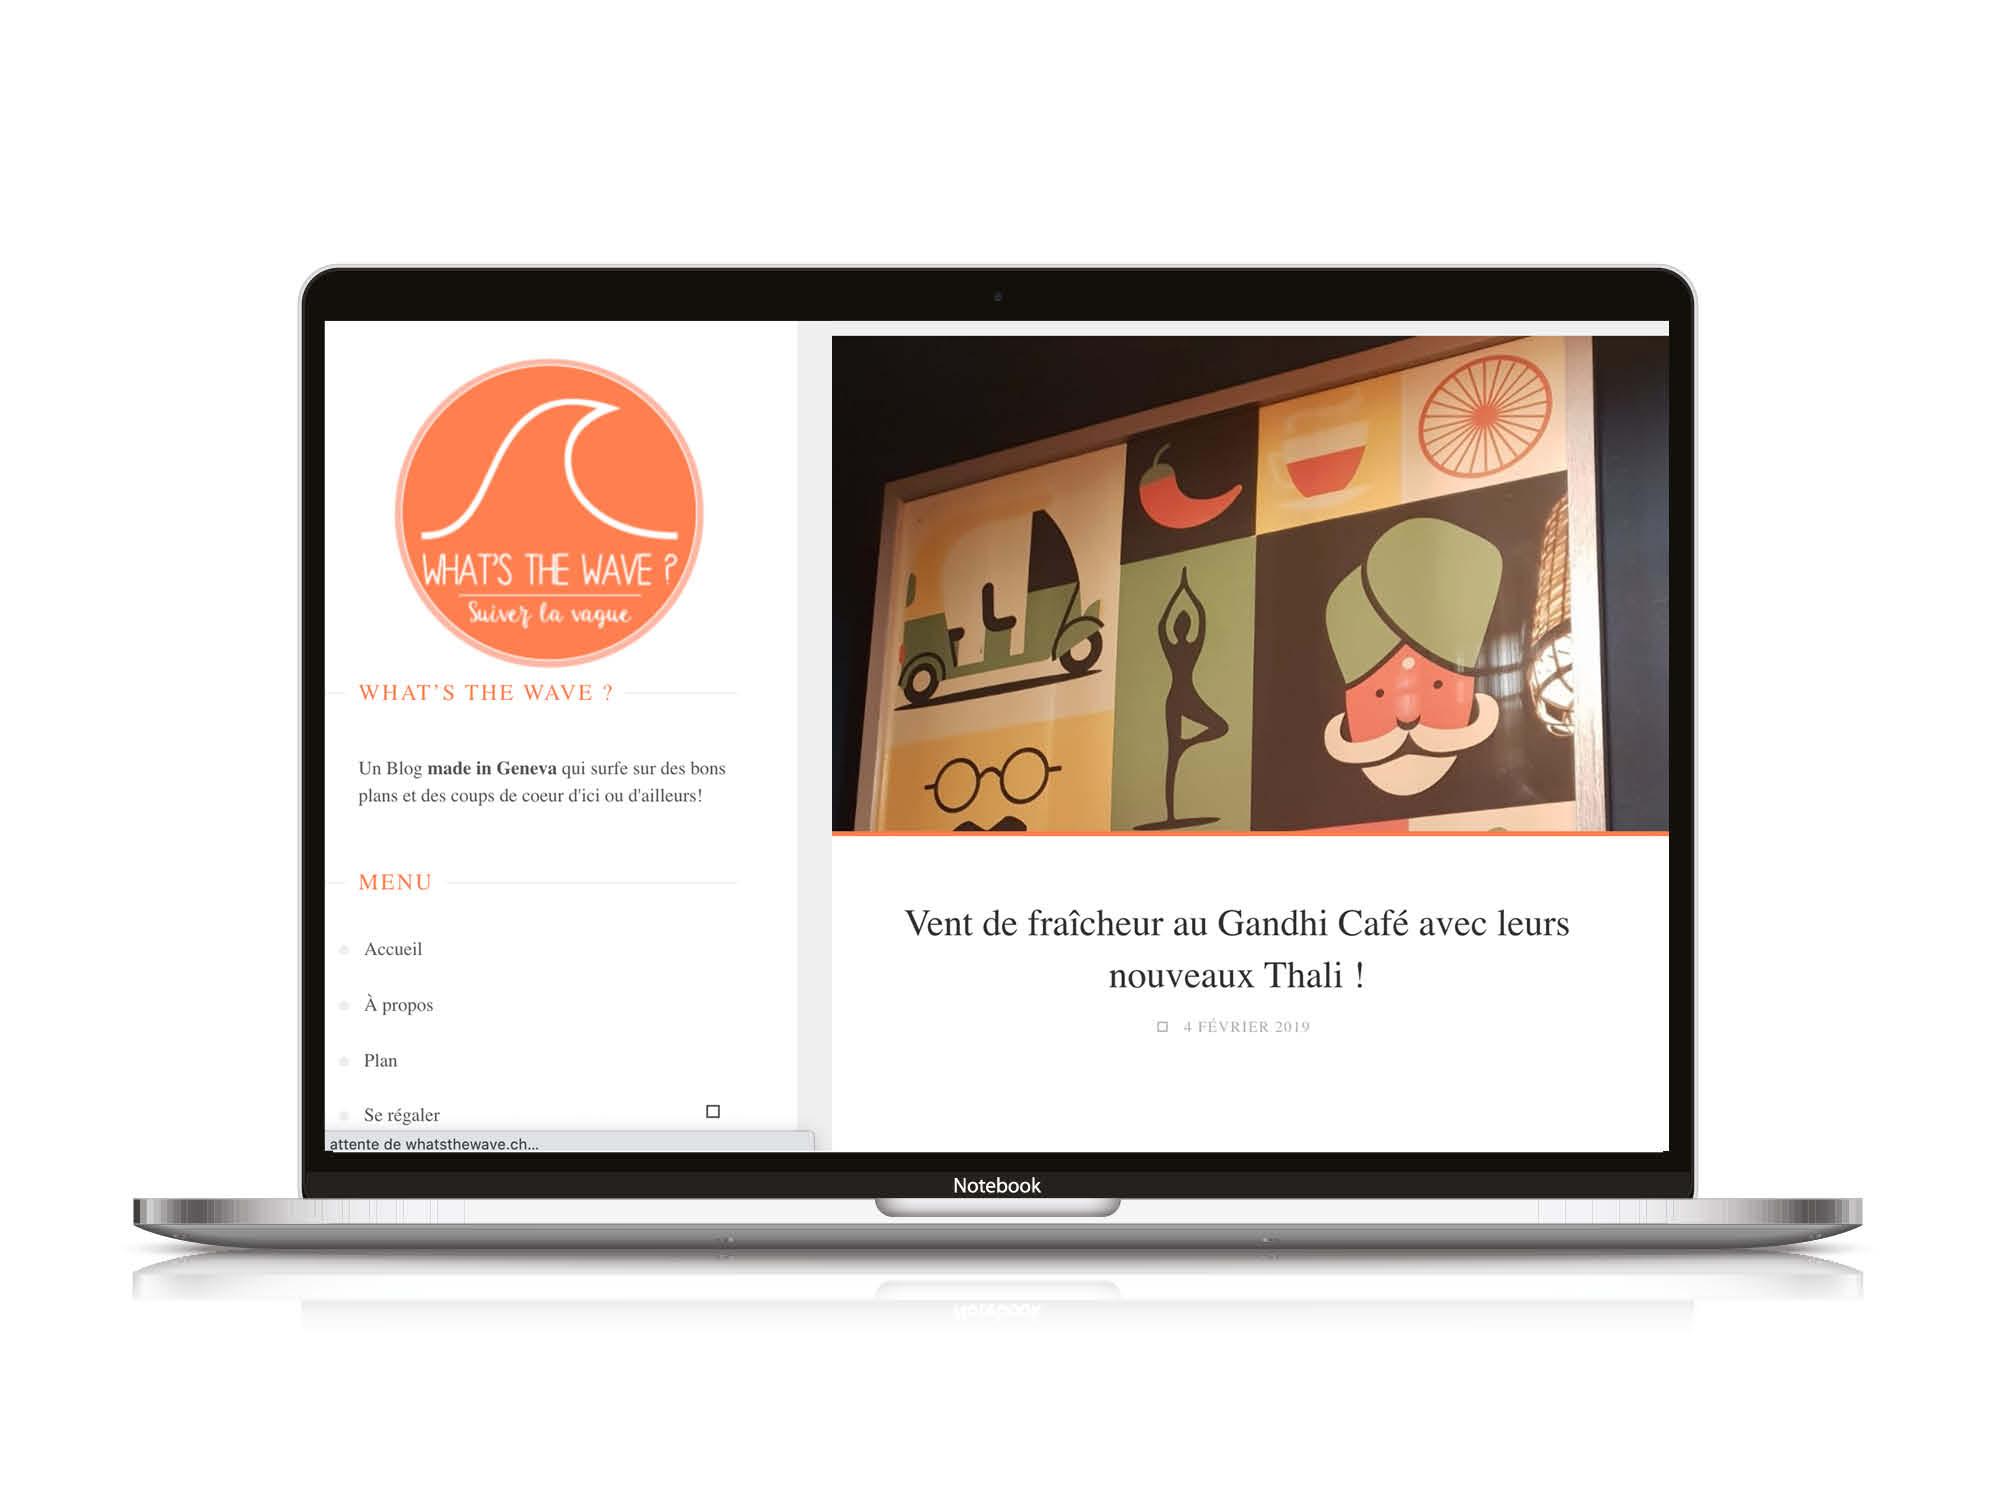 Blog Gault & Millau Café Gandhi Geneve